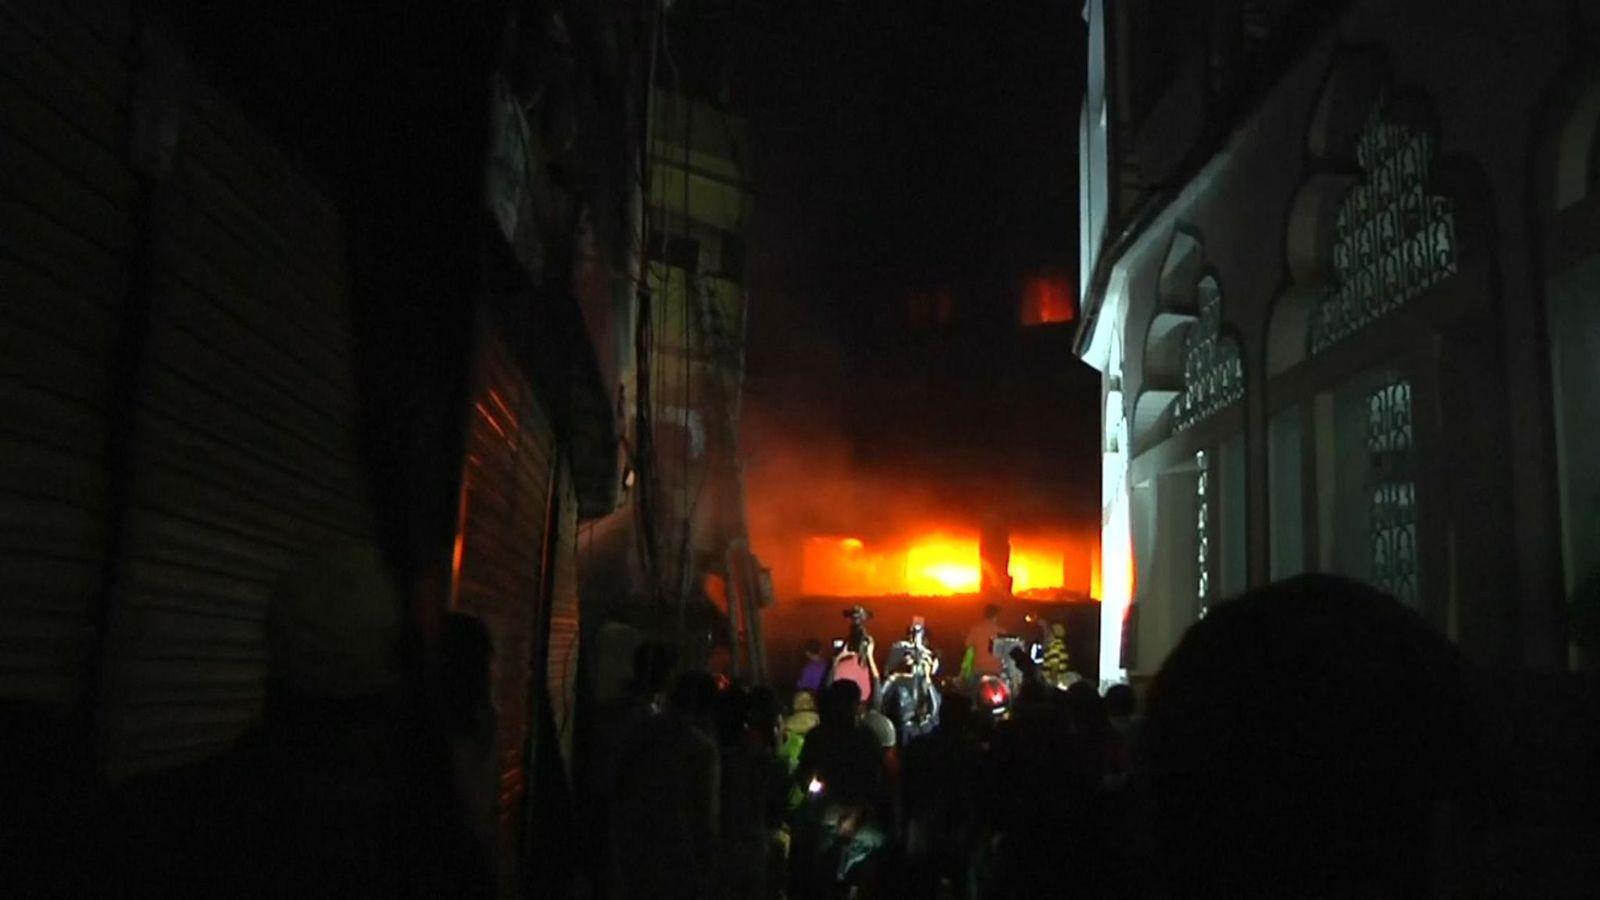 At least 70 die in Bangladesh plastics warehouse fire